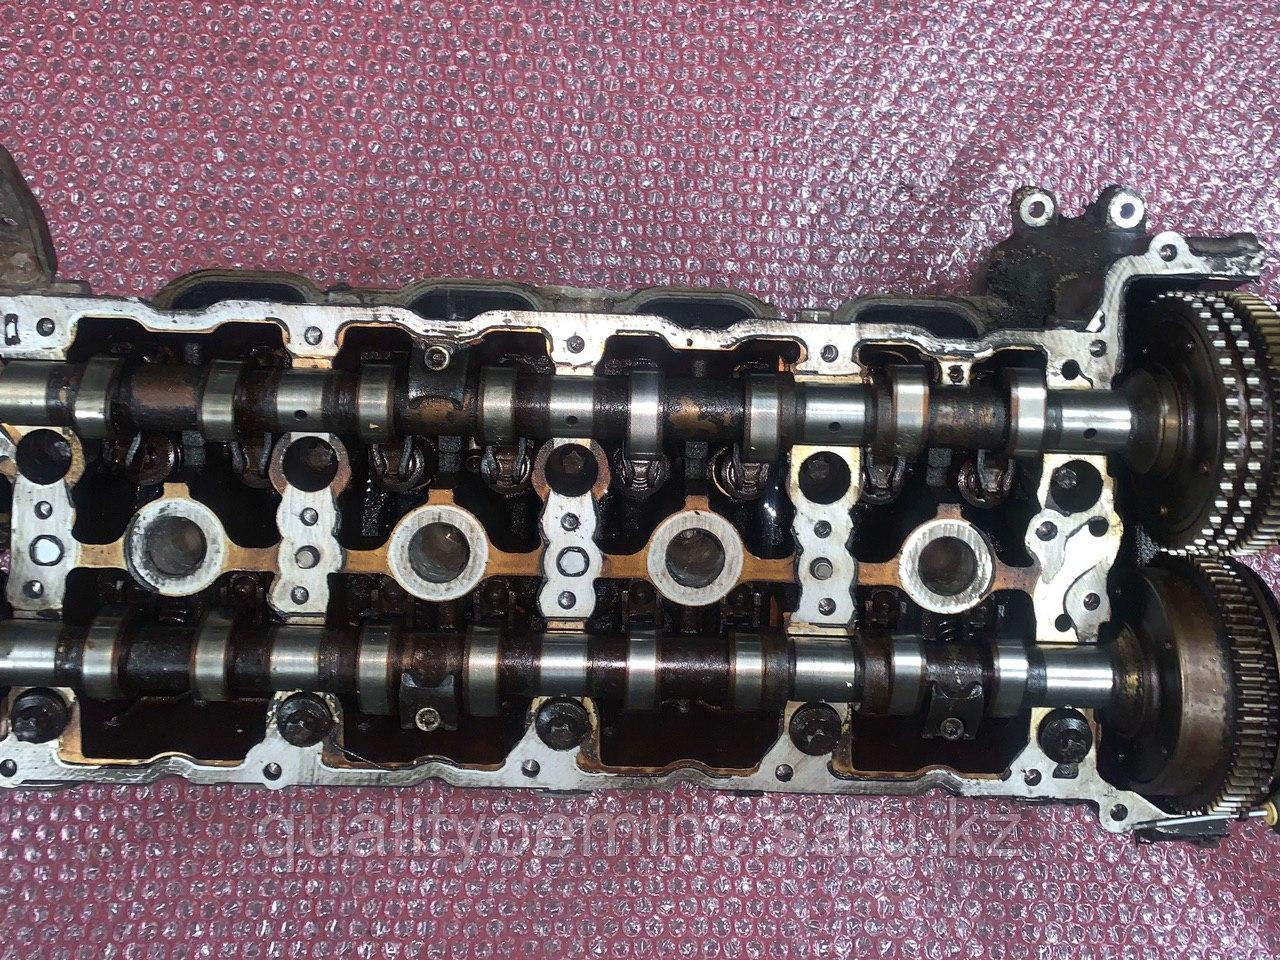 R2730162901 - головка блока цилиндров Mercedes S-CLASS (W221)